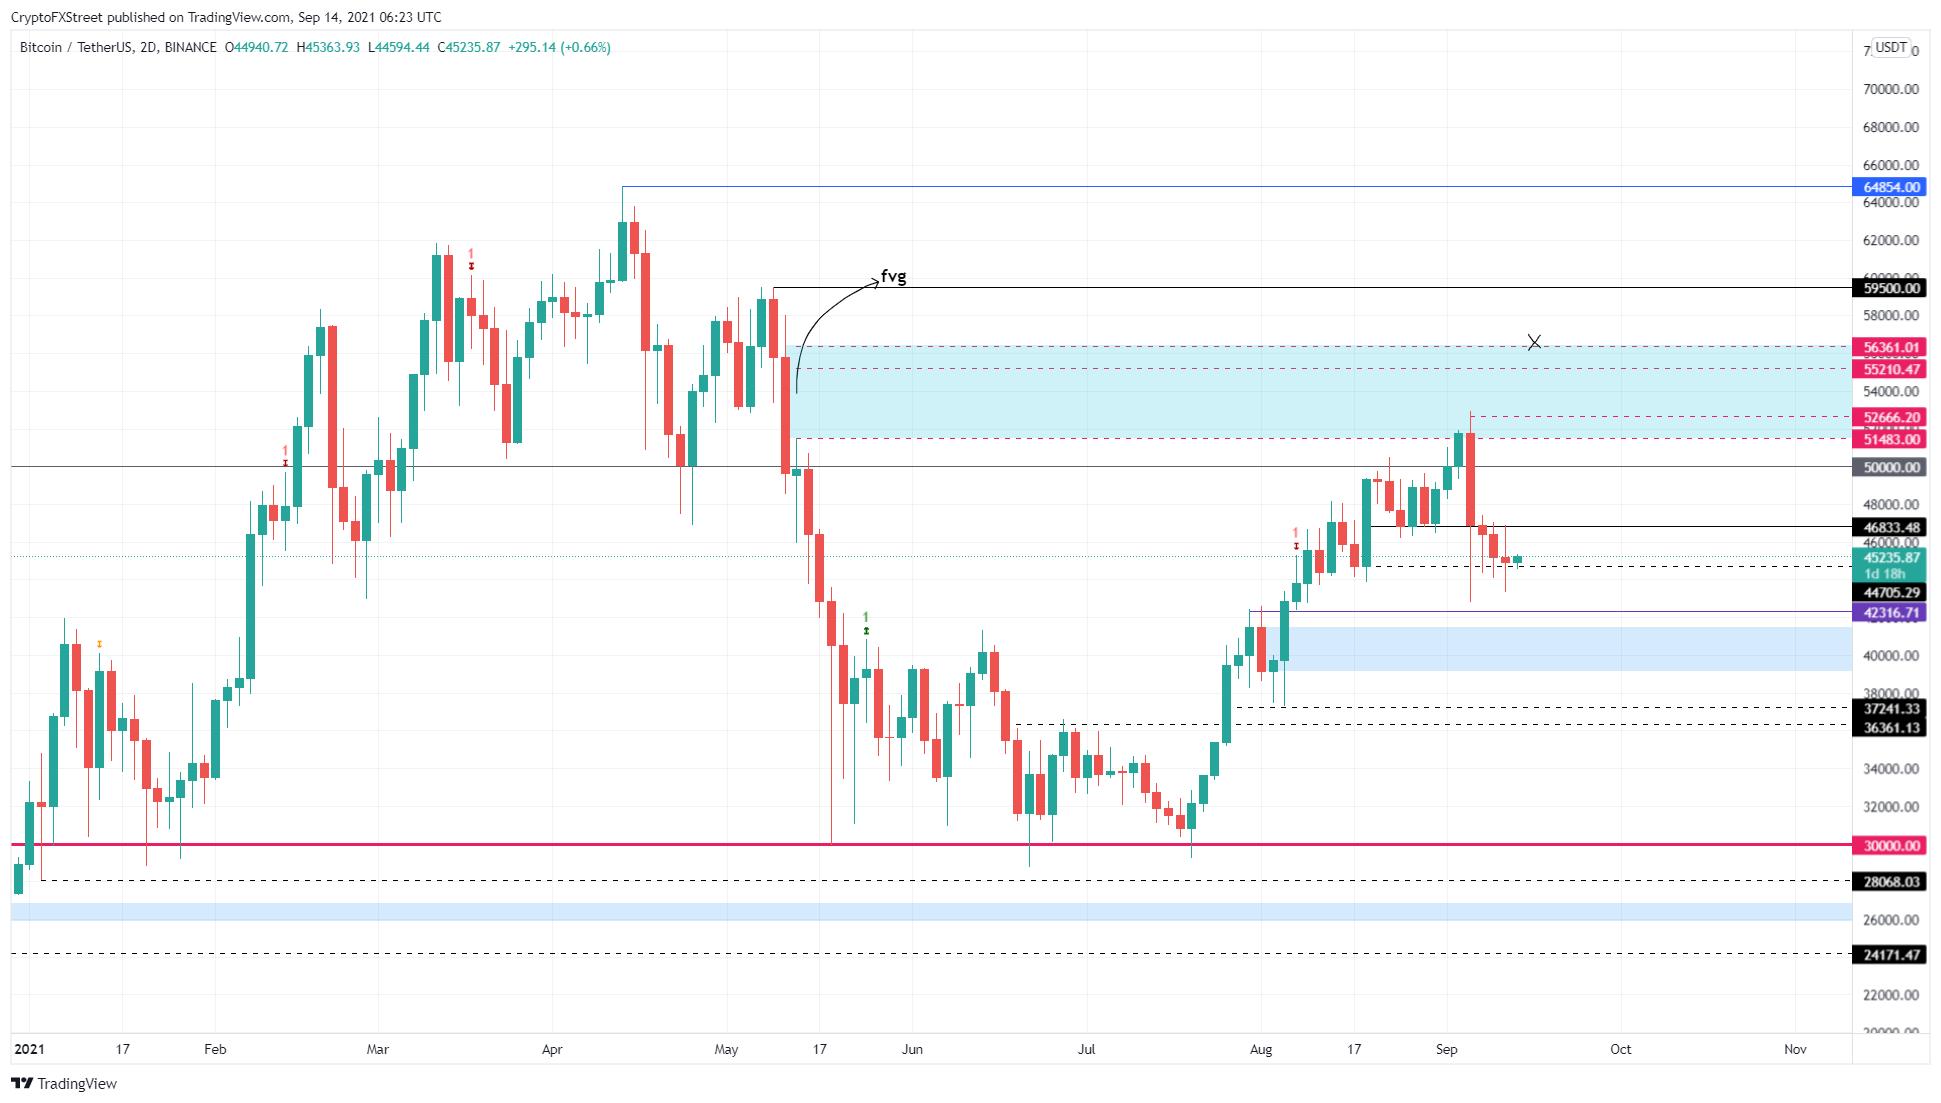 BTC/USDT 2-day chart